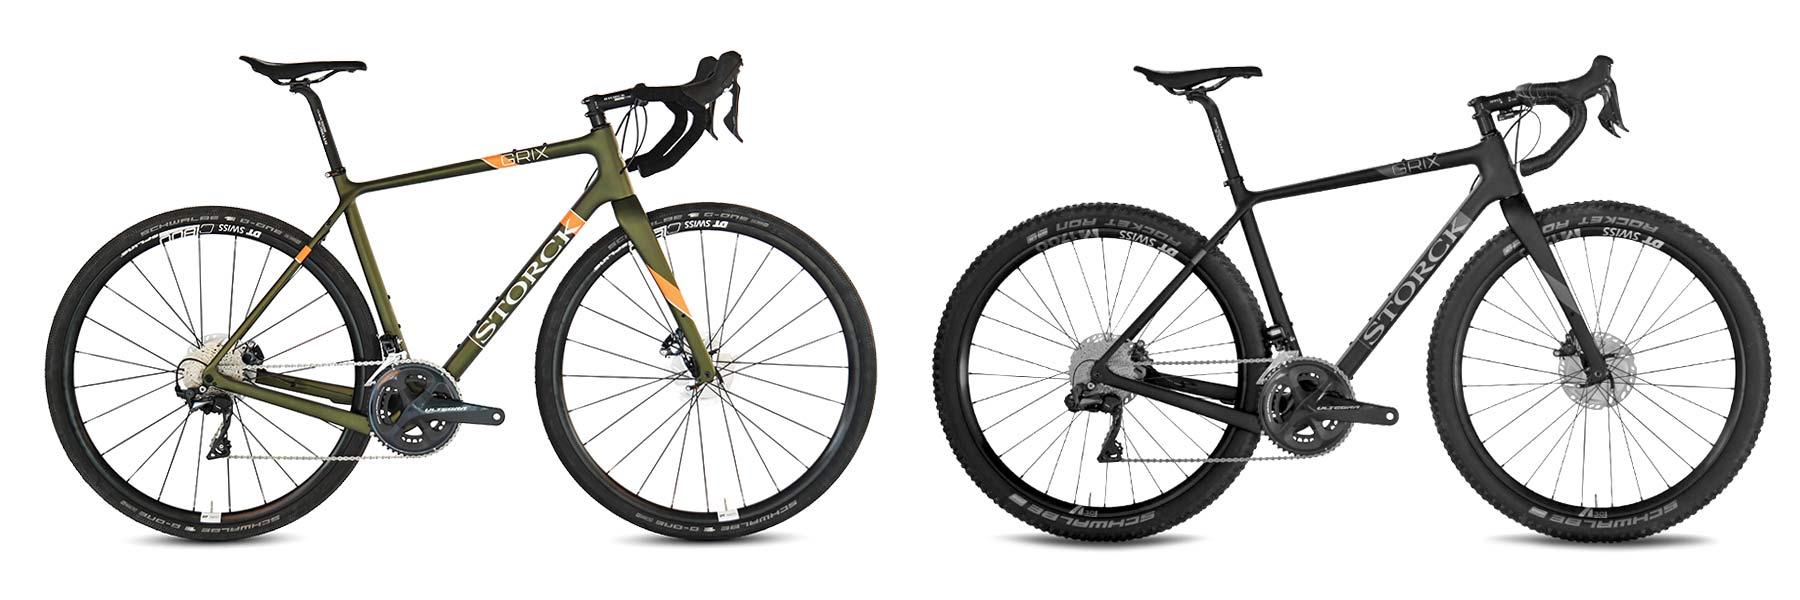 Storck GRIX Pro gravel bike, SRAM Rival eTap AXS Wide update,Pro or Platinum